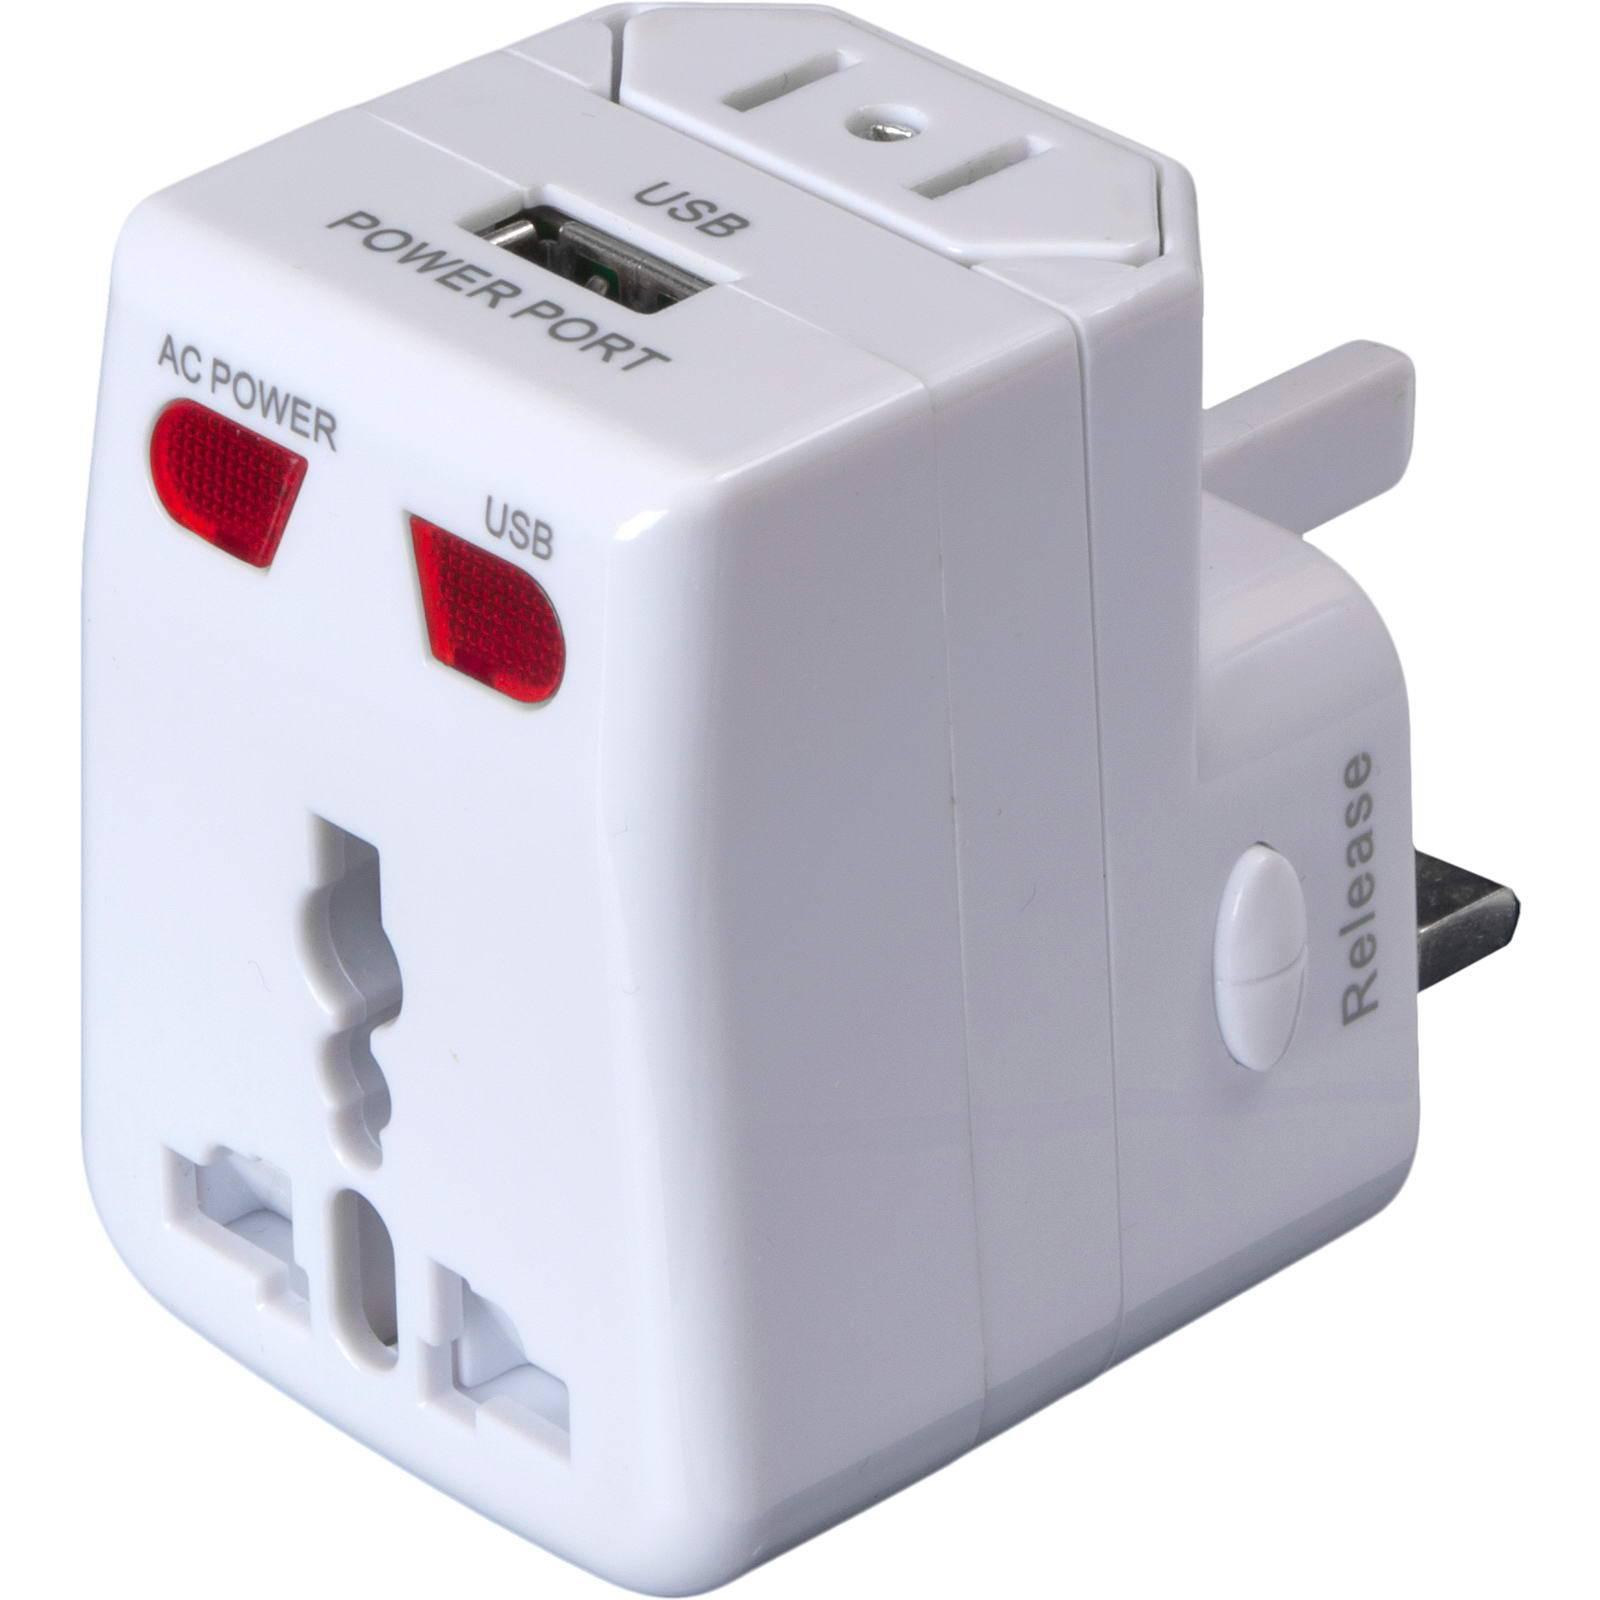 Relags Universal USB Steckeradapter - Bild 2